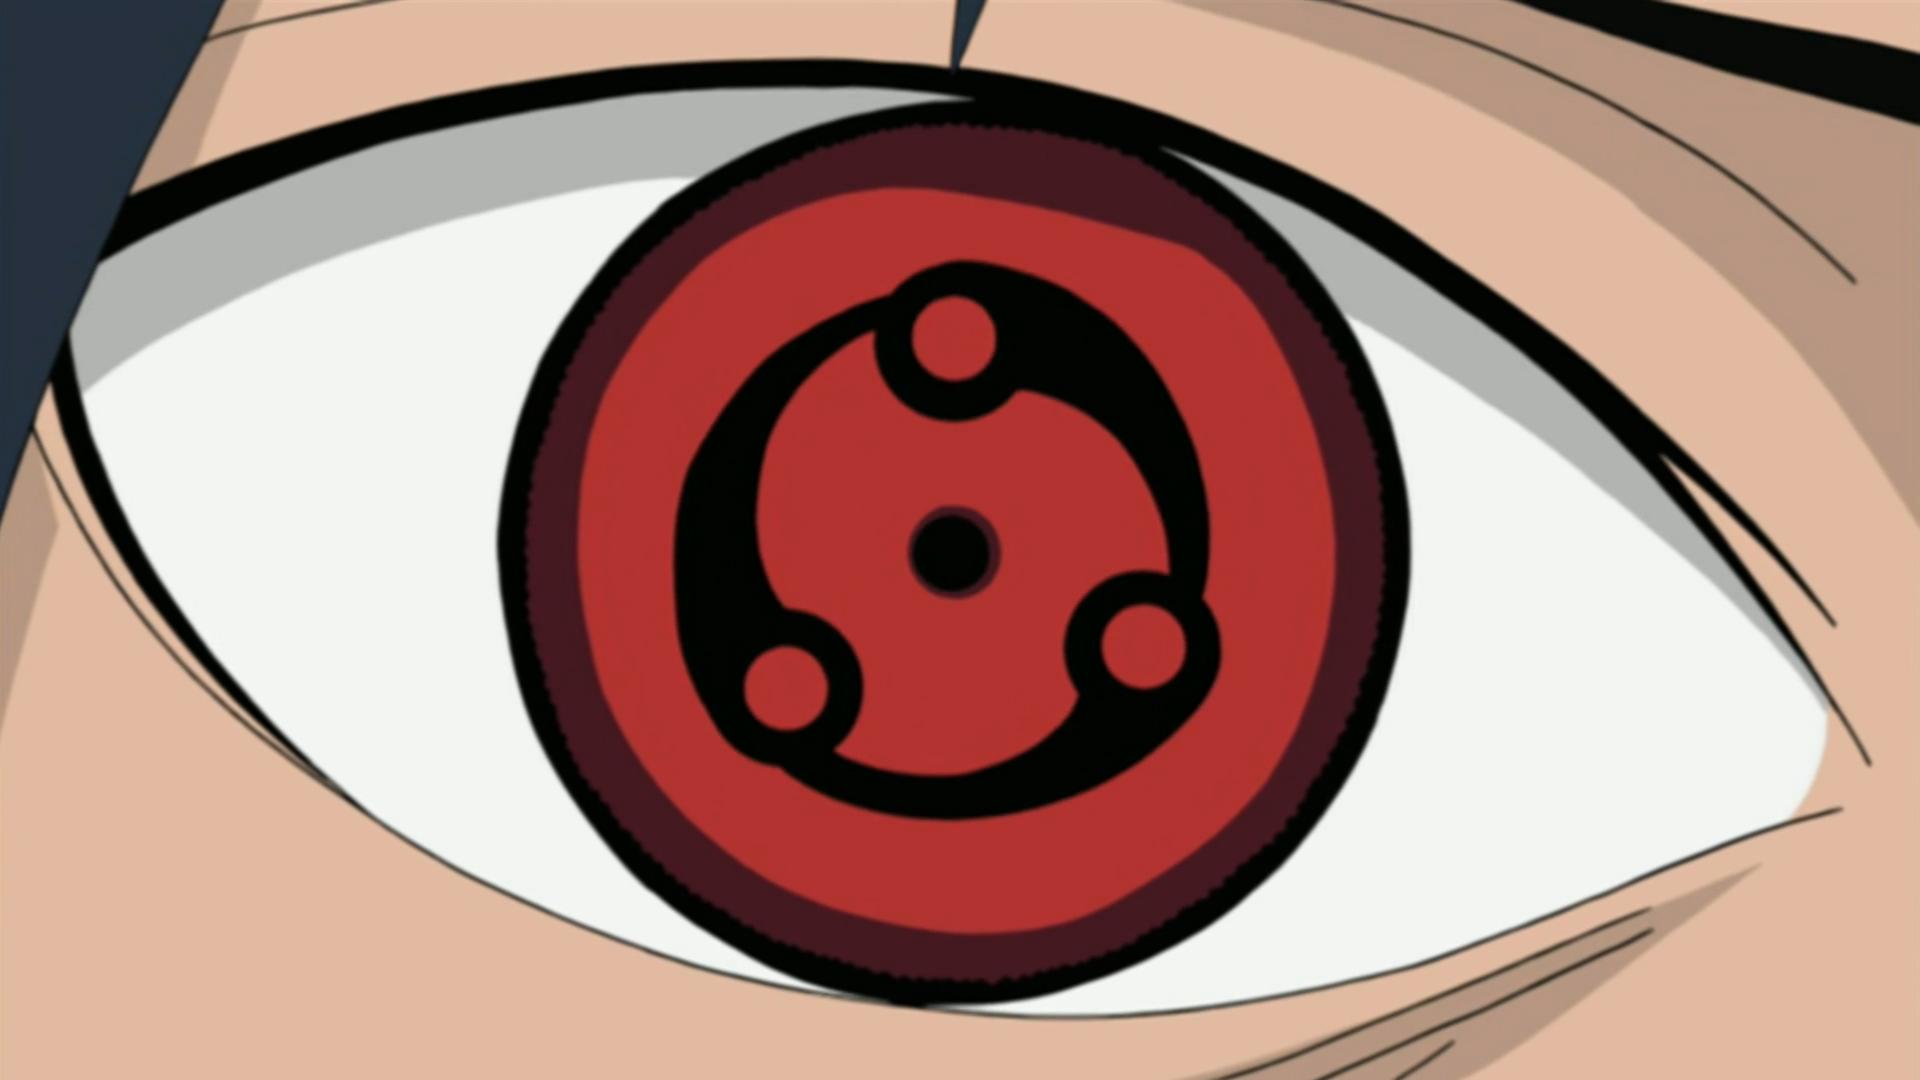 Madara Uchiha Narutopedia Fandom Powered By Wikia